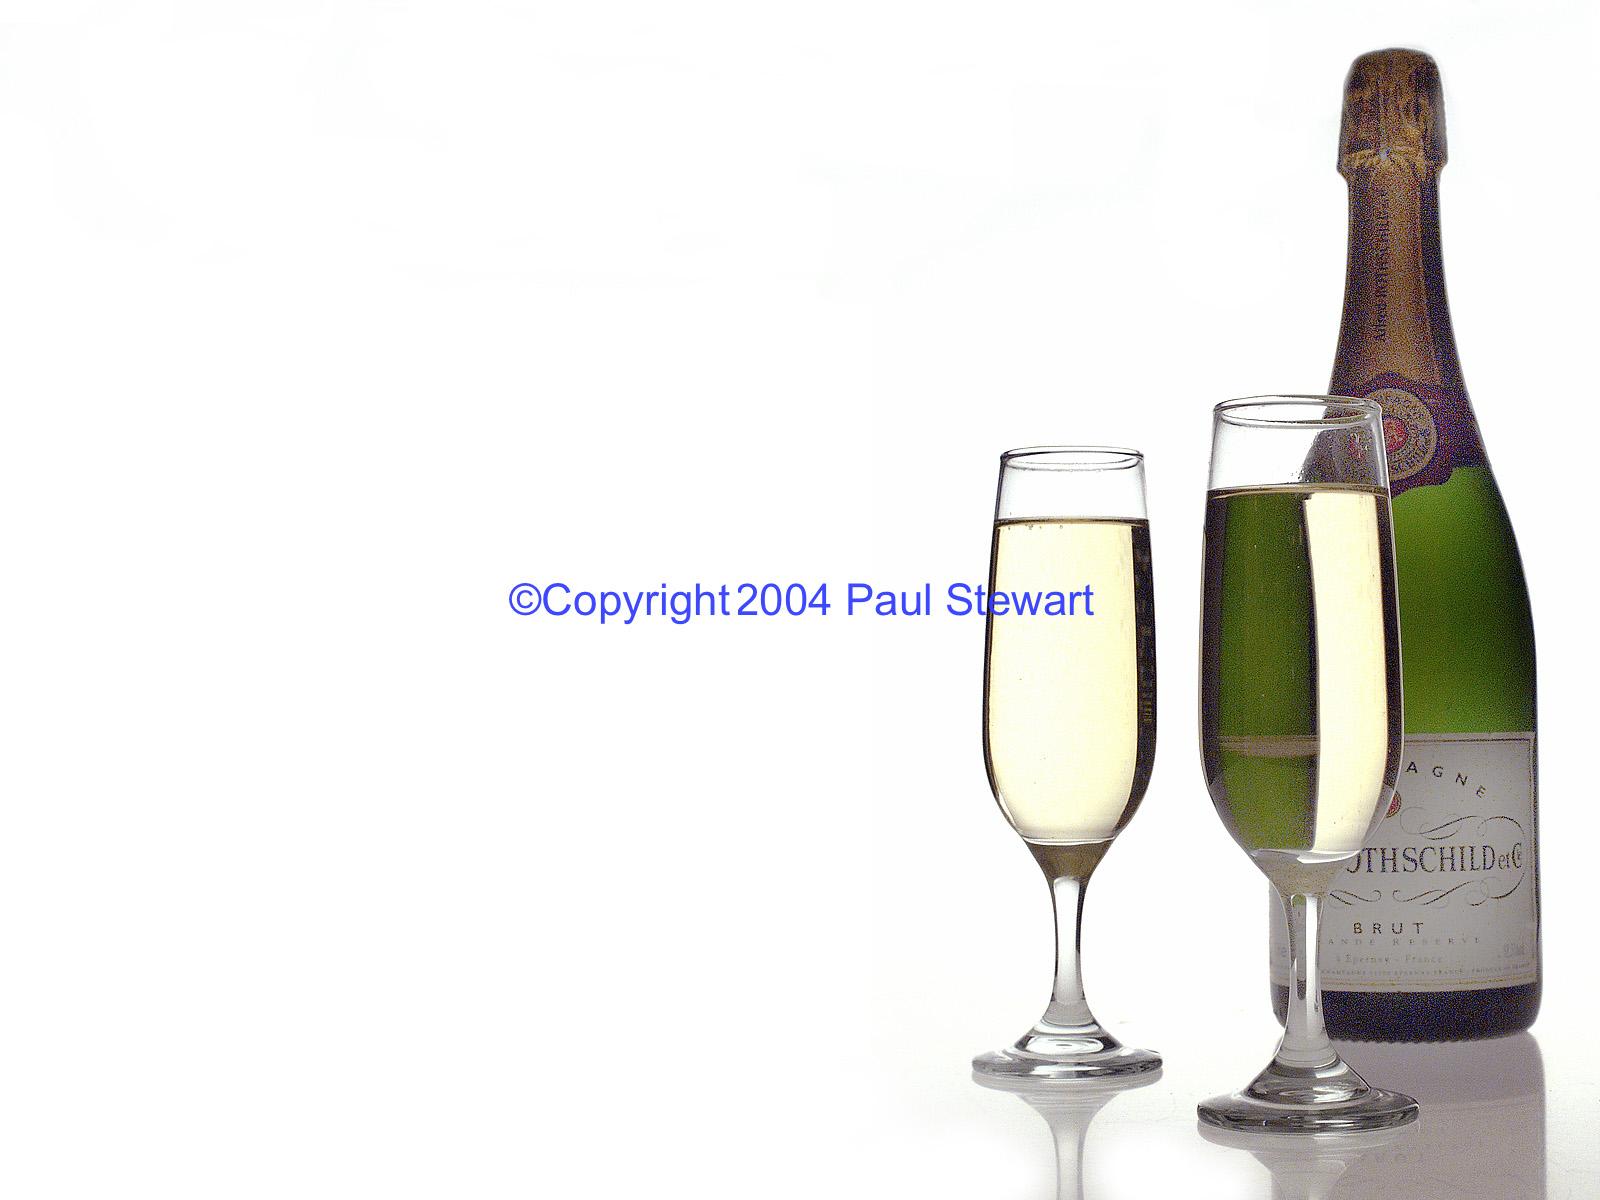 Champagne Glasses / Bottle ©Paul Stewart/Retna 2005 Credit All Uses Digital File Only